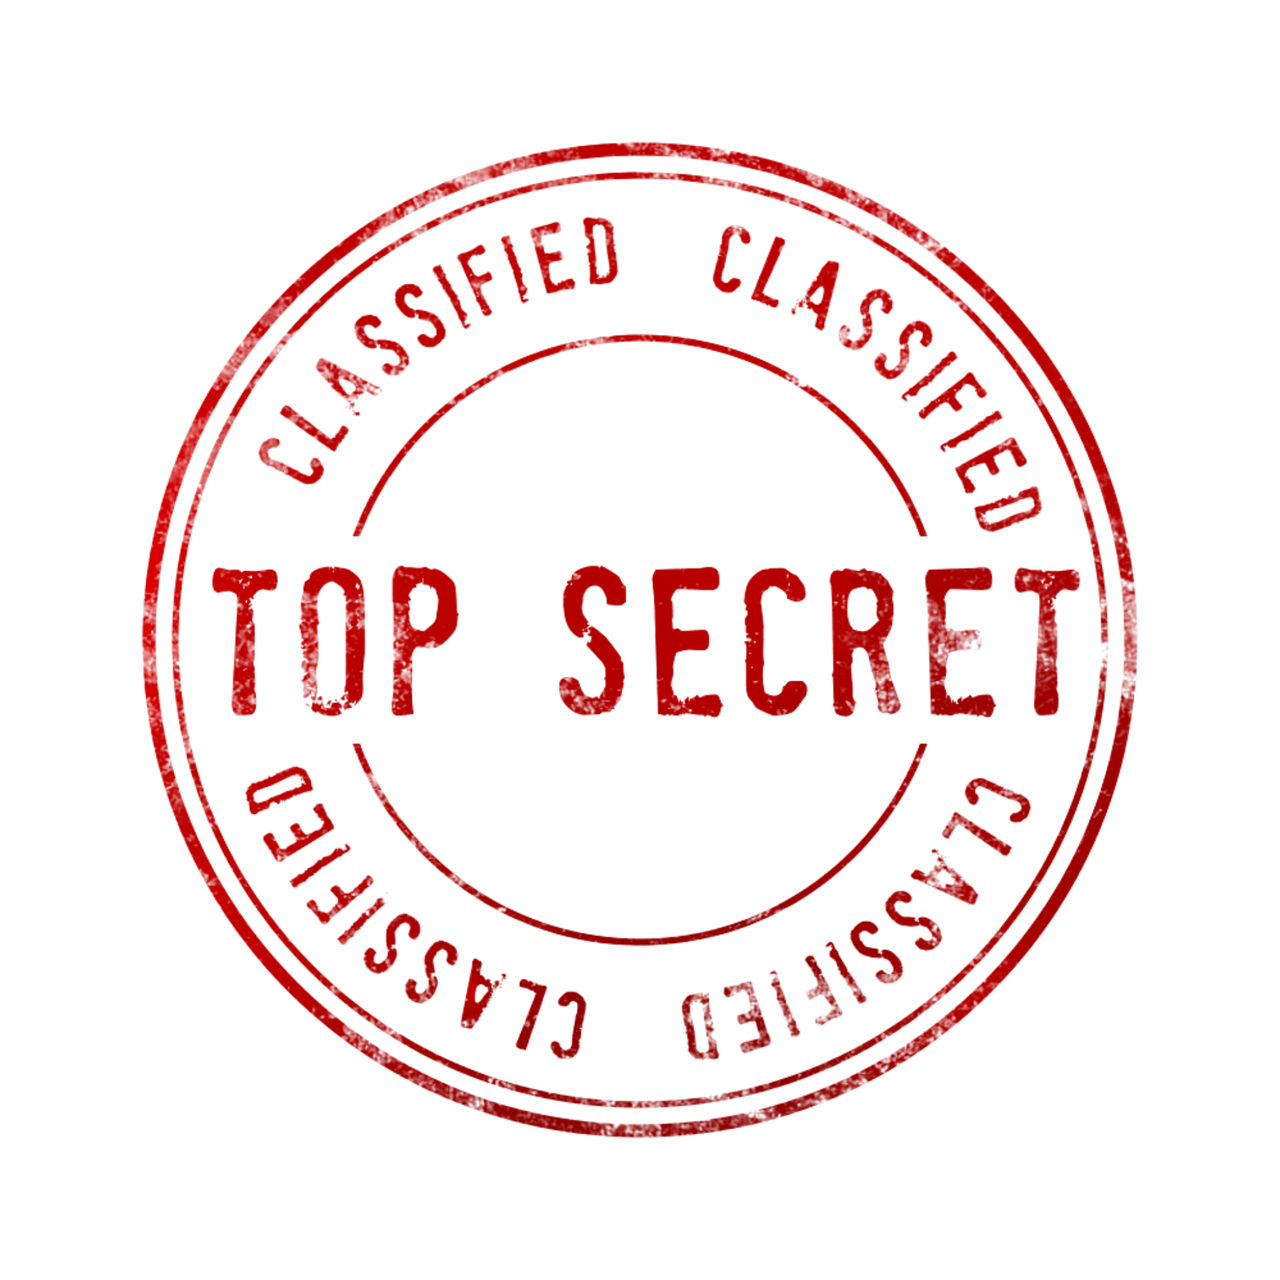 Patents Trade Secrets NDA Nondisclosure Agreements